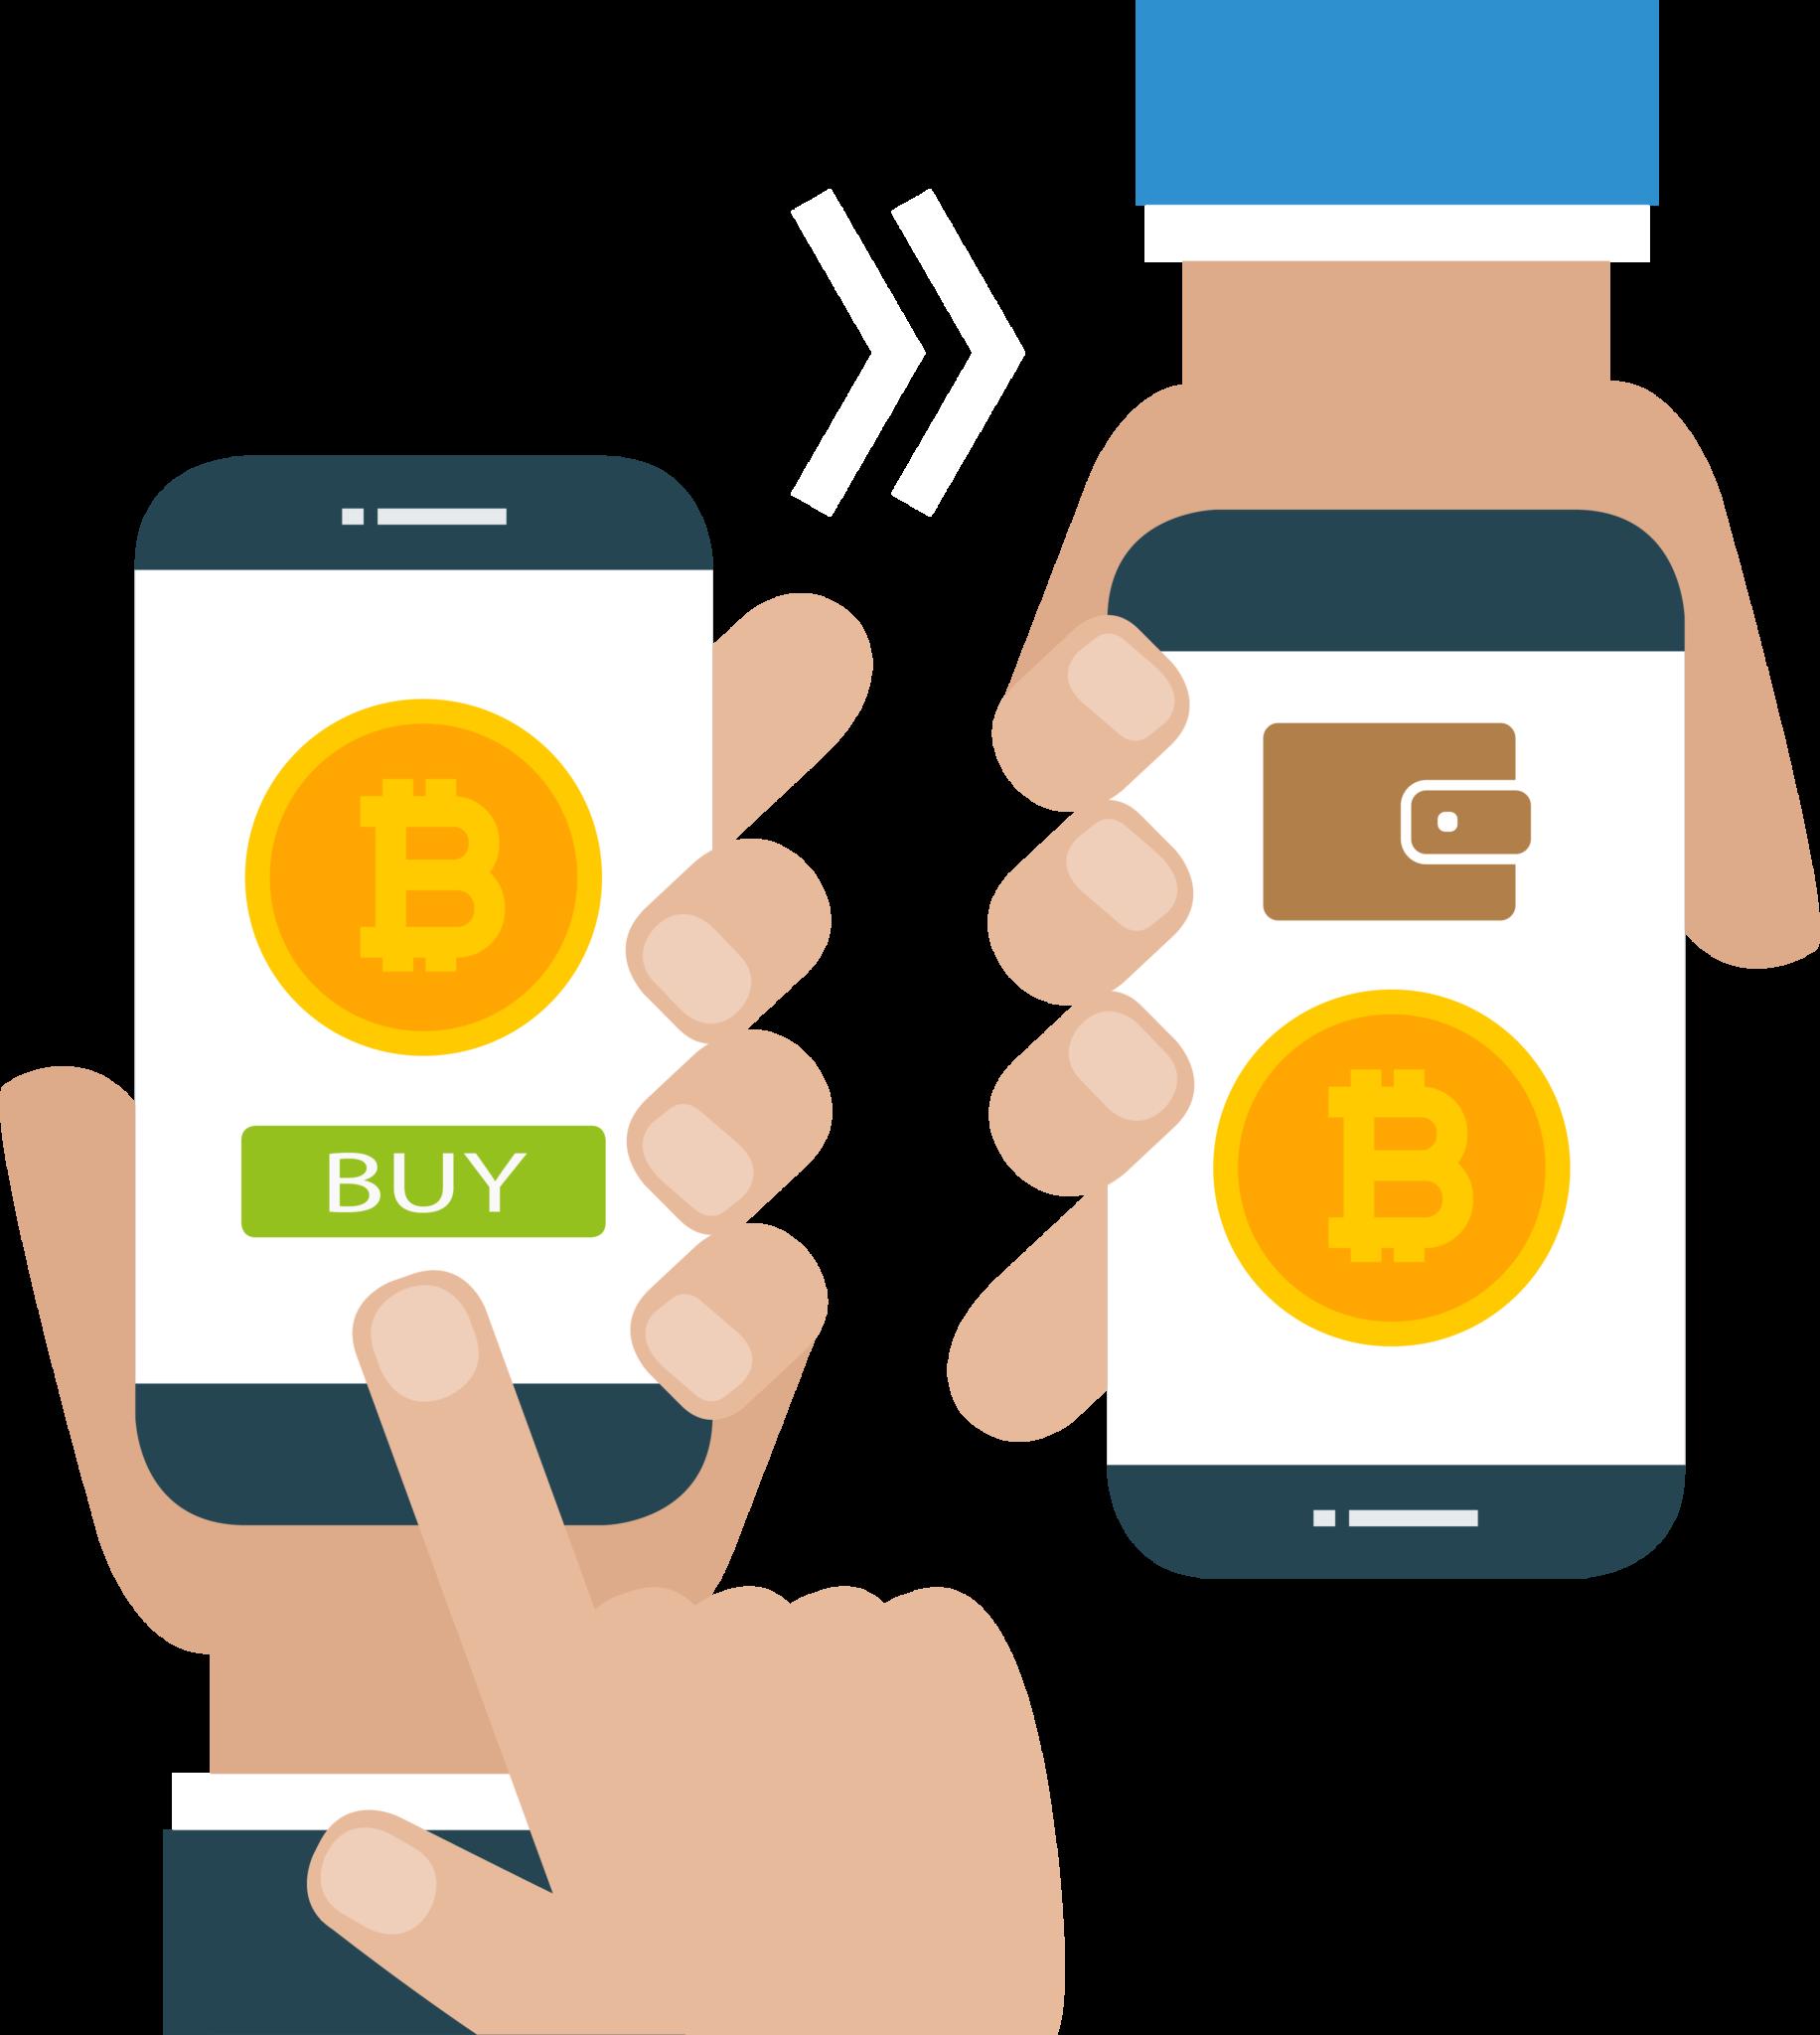 Buy bitcoin on phone